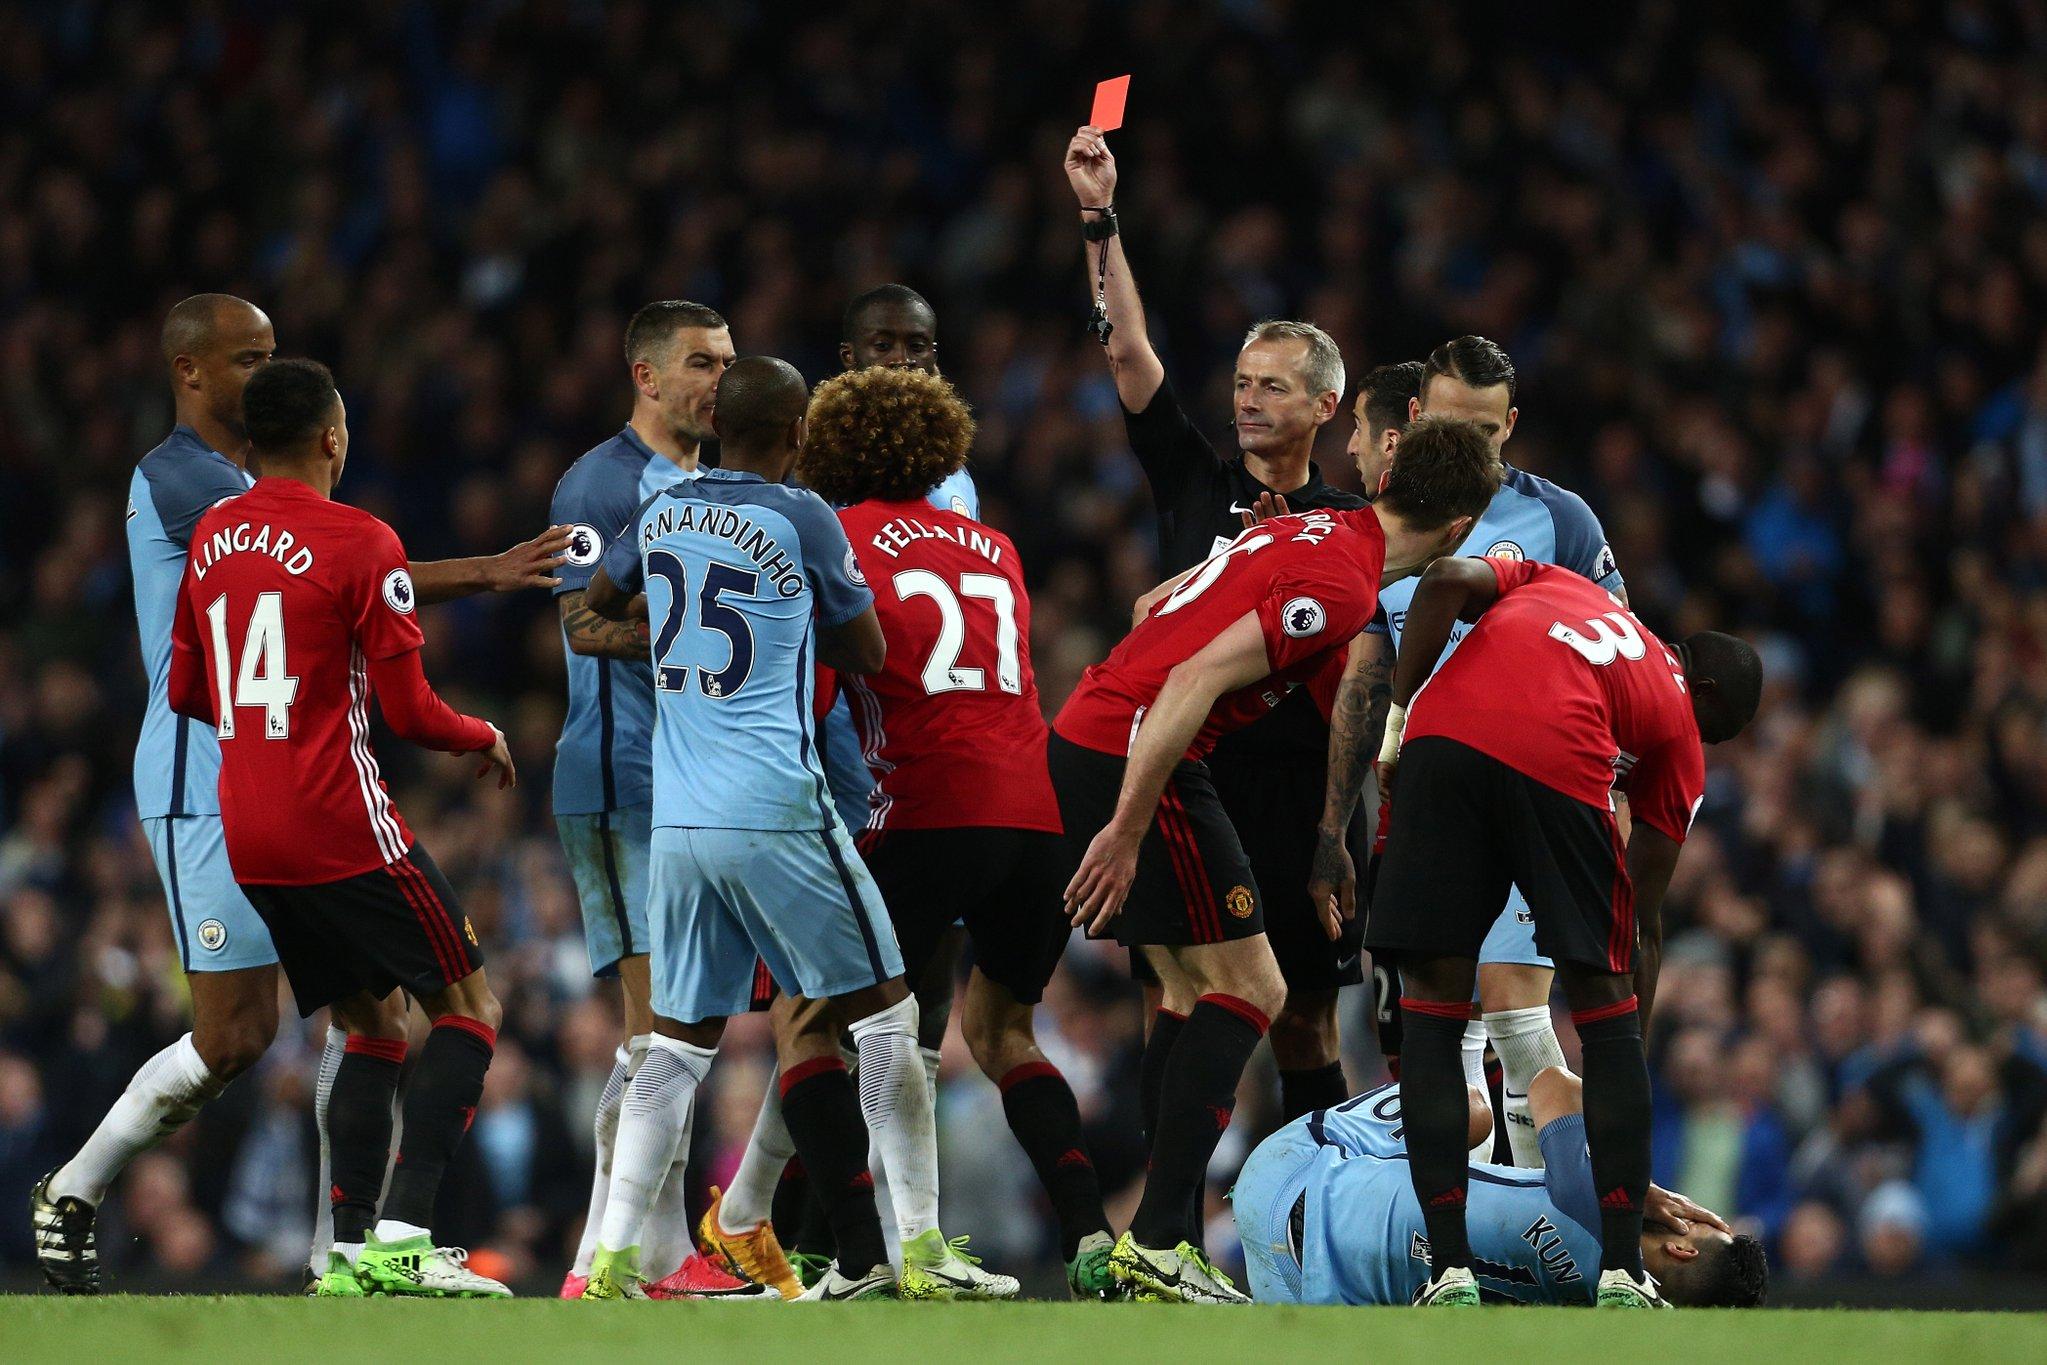 Iheanacho Dropped, Fellaini Sent Off As Man United Hold Man City